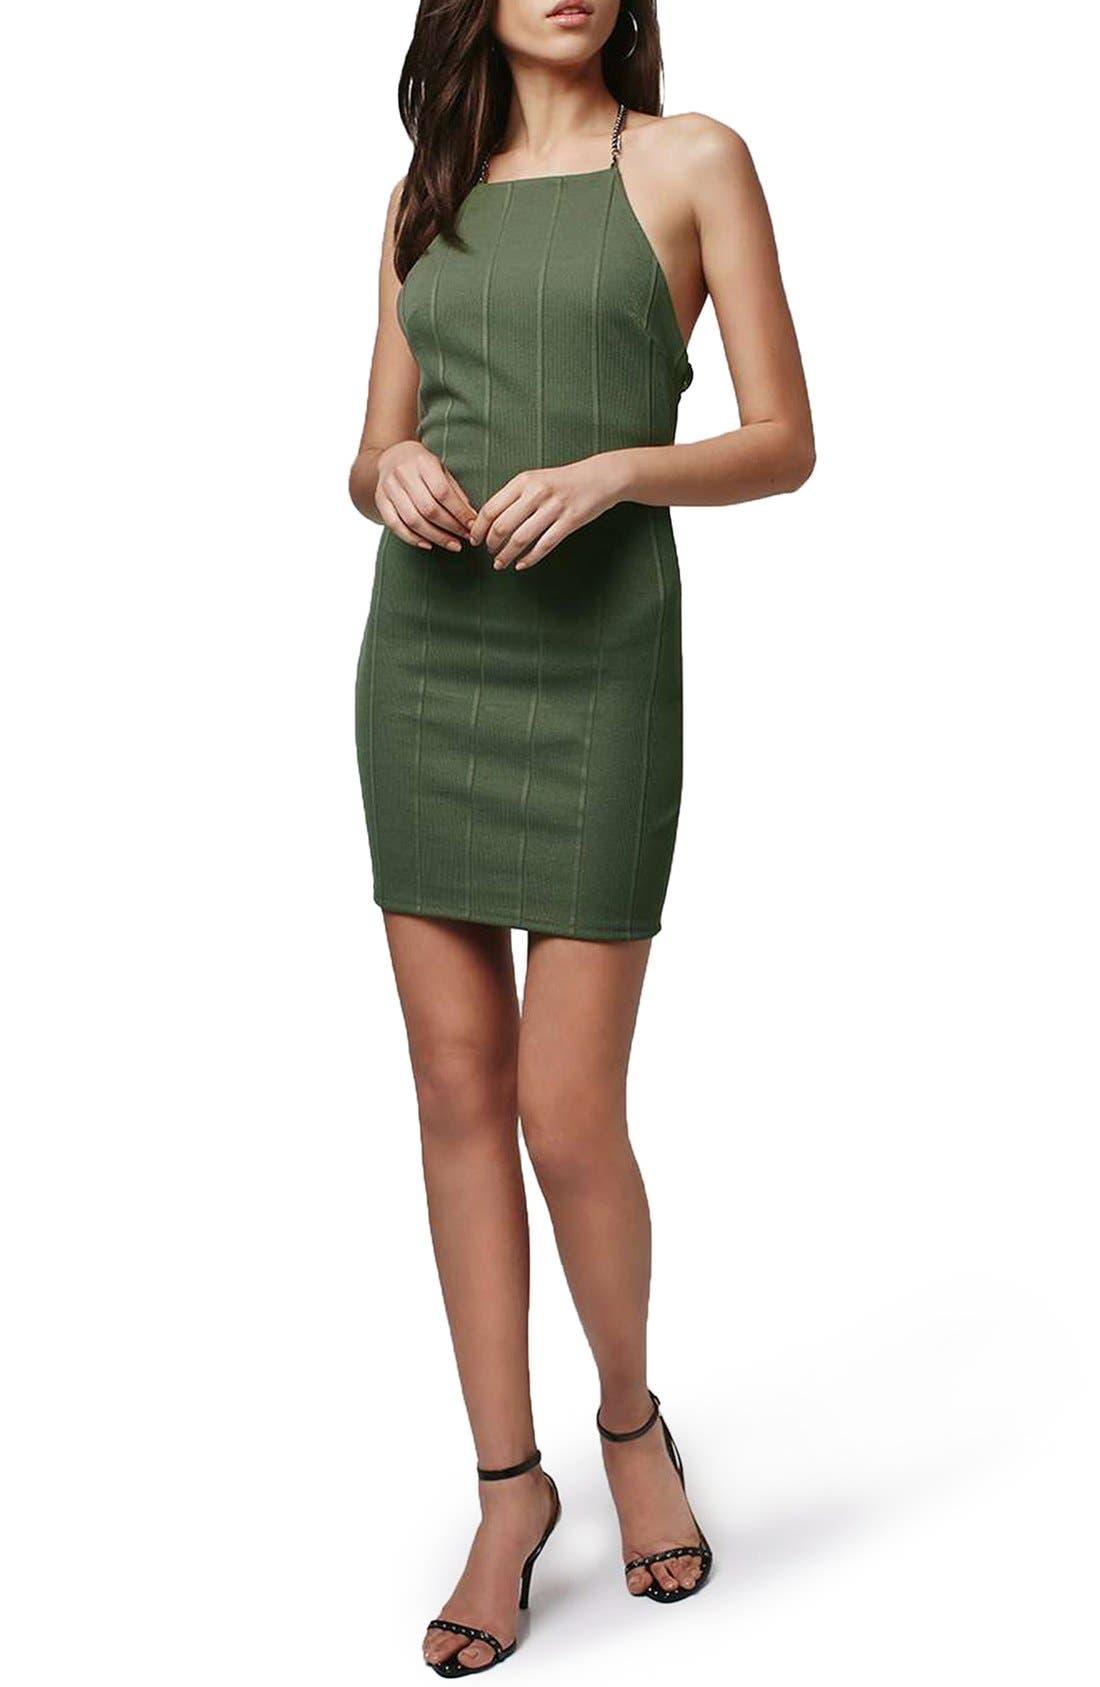 Main Image - Topshop Chain Strap Bandage Body-Con Dress (Regular & Petite)